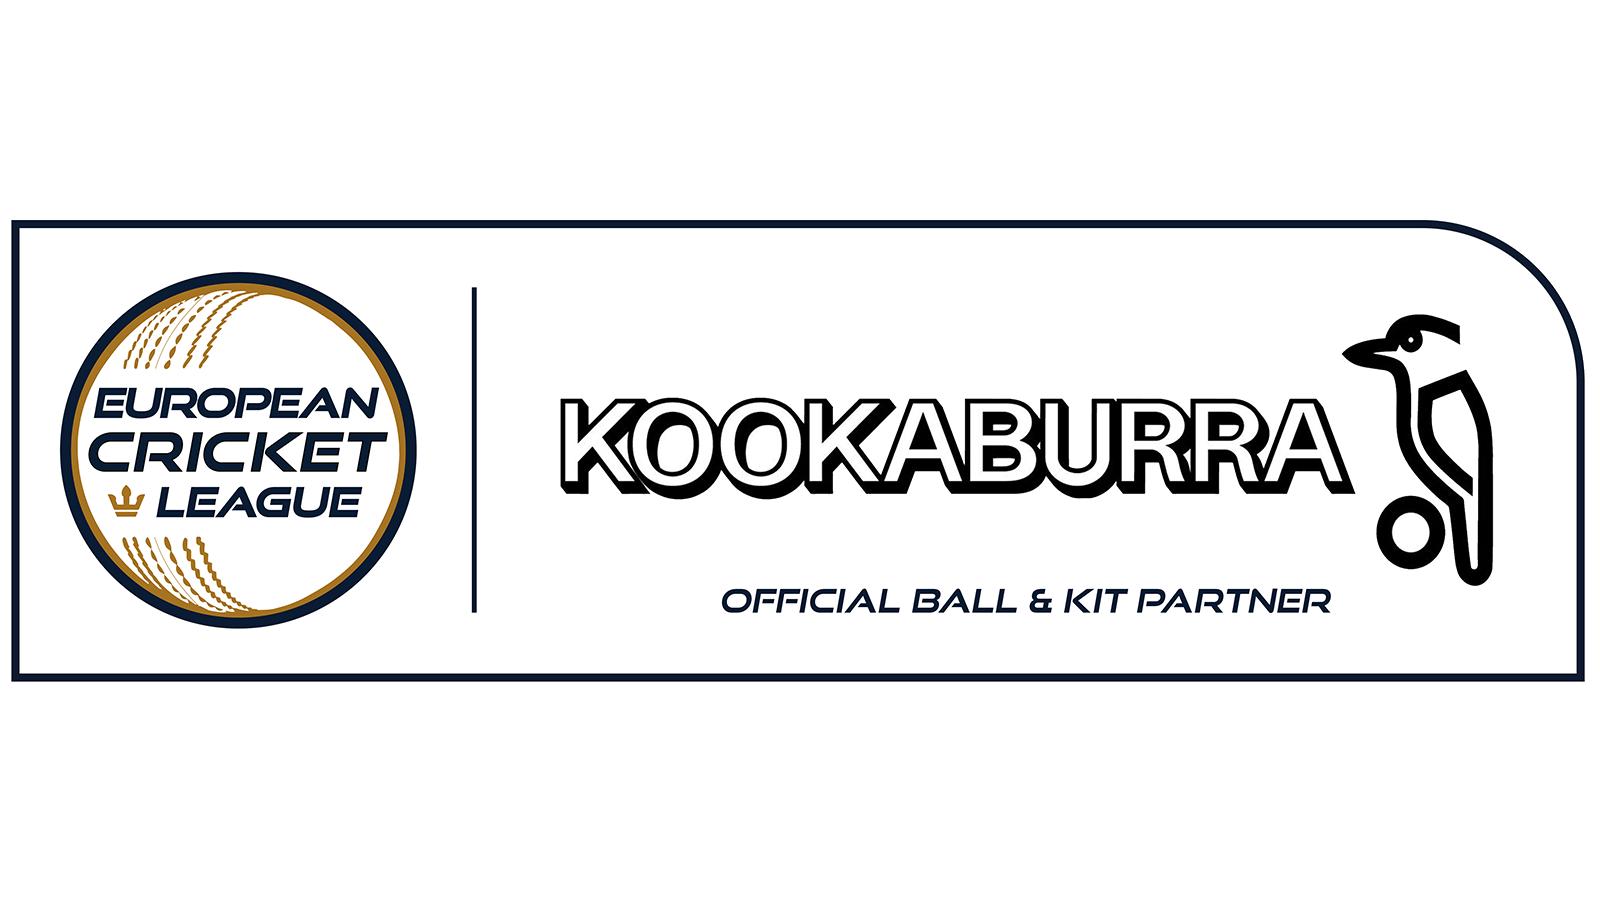 Kookaburra_1600x900.png